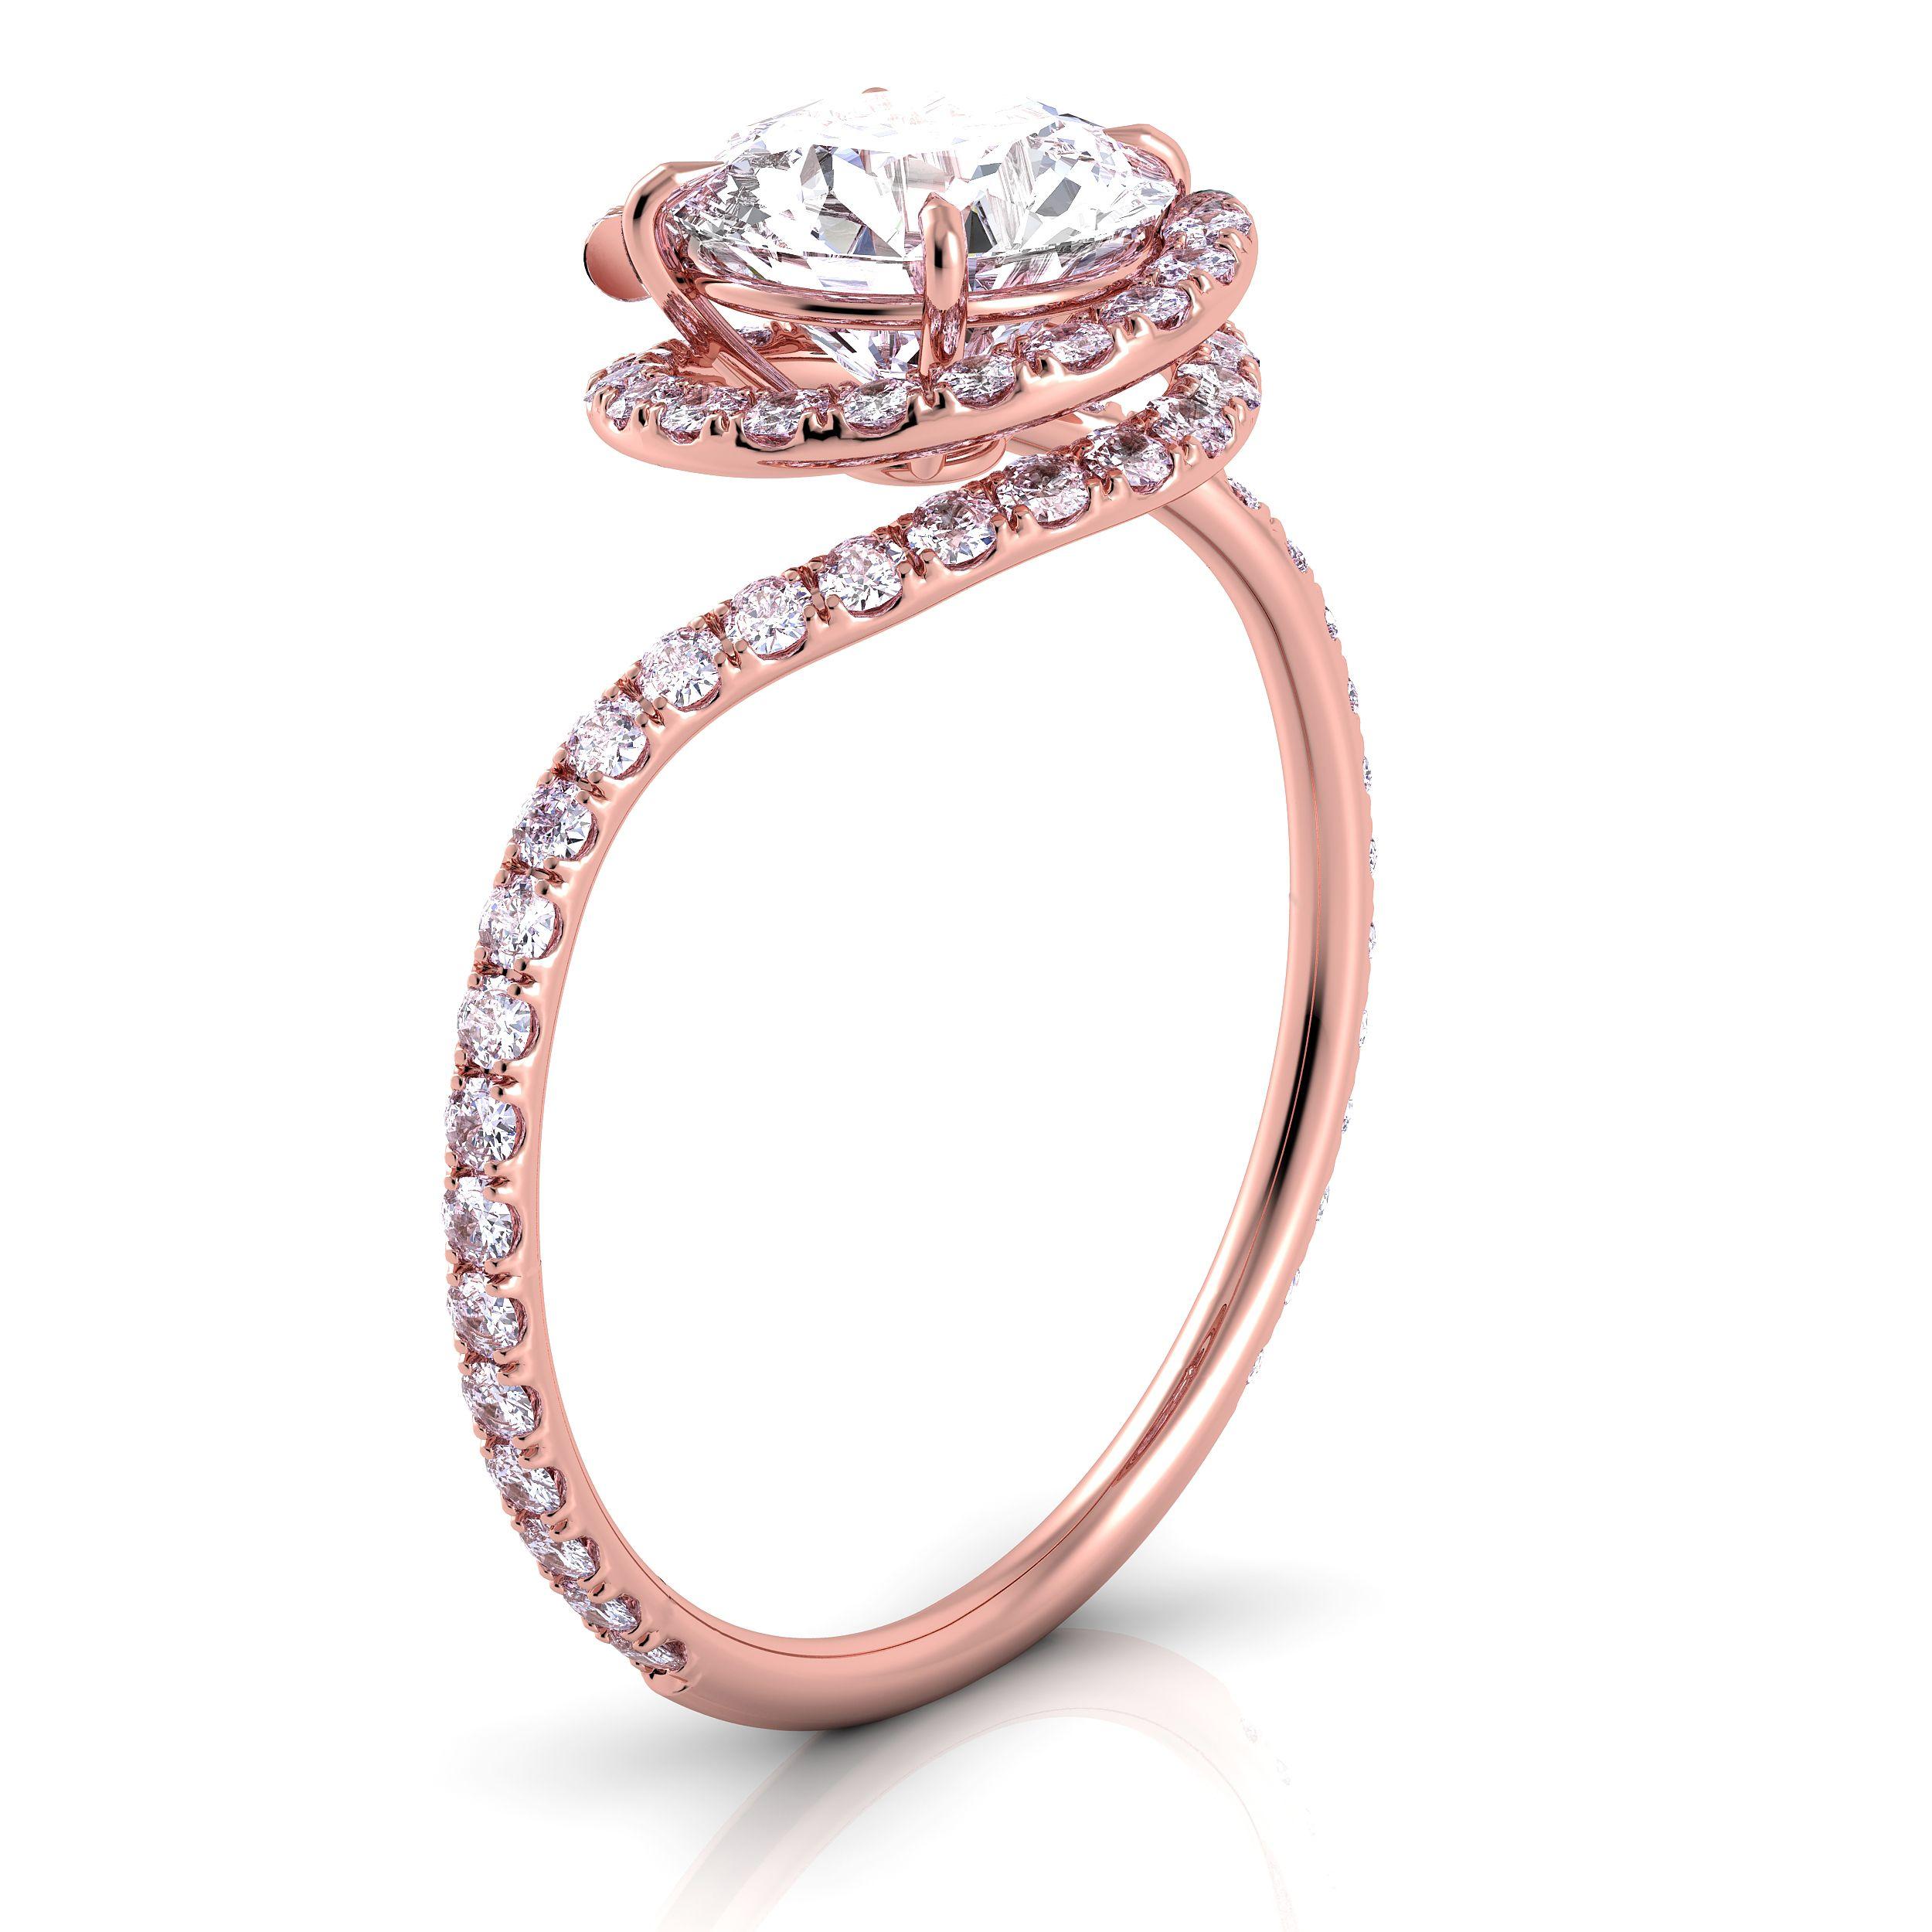 Danhov Abbraccio Diamond Swirl Engagement Ring In 18k Rose Gold Style  Ae100 Handcrafted In